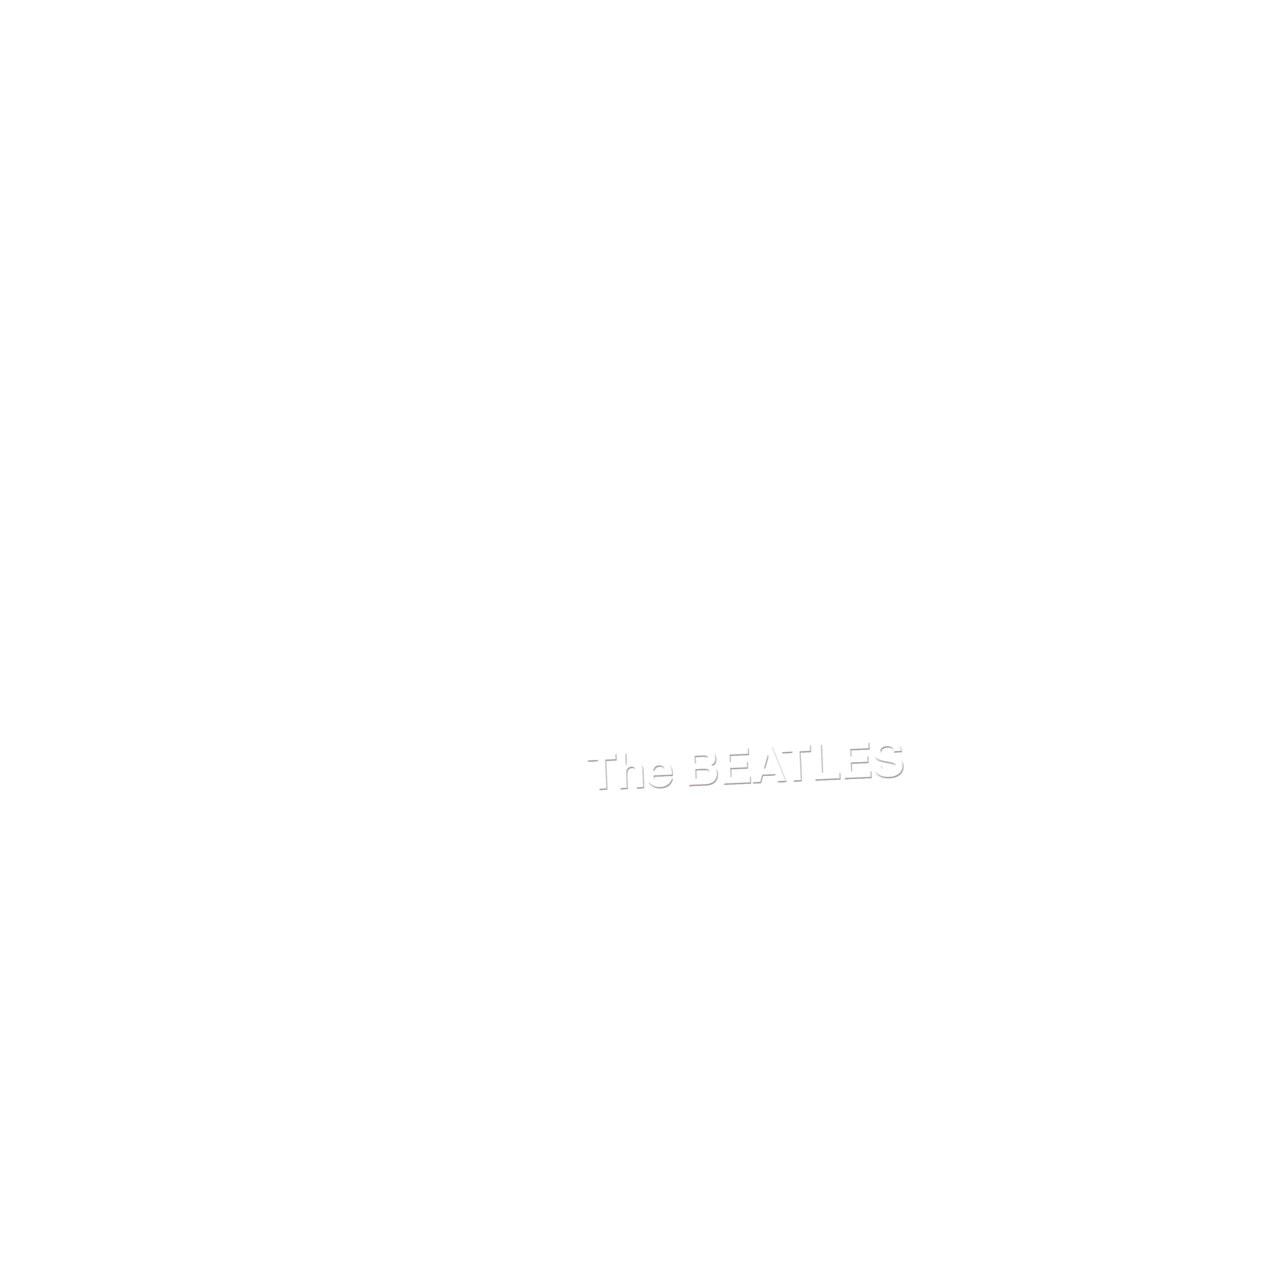 The Beatles - 1